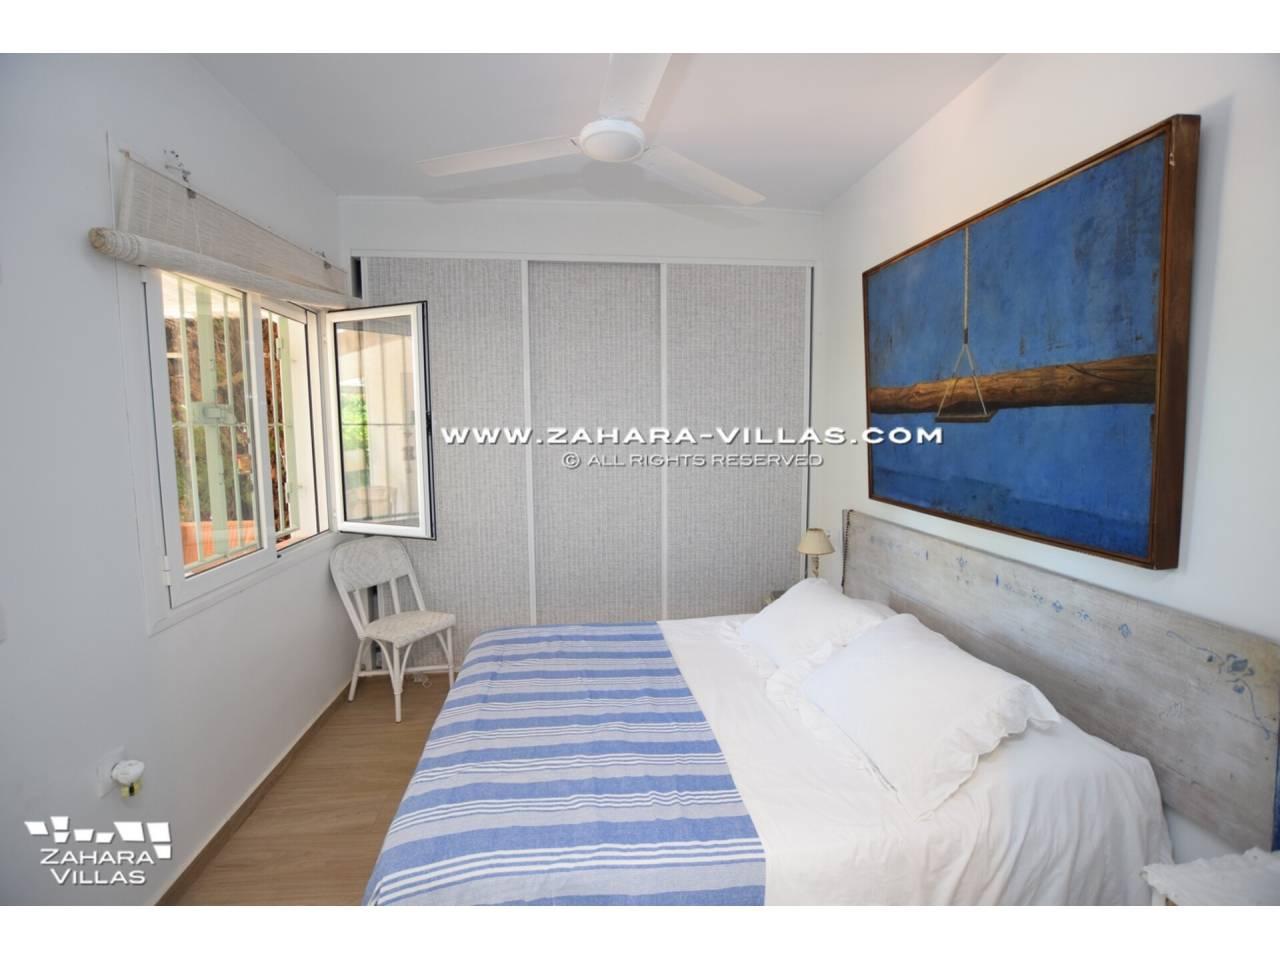 Imagen 24 de House for sale close to the beach, with sea views in Zahara de los Atunes